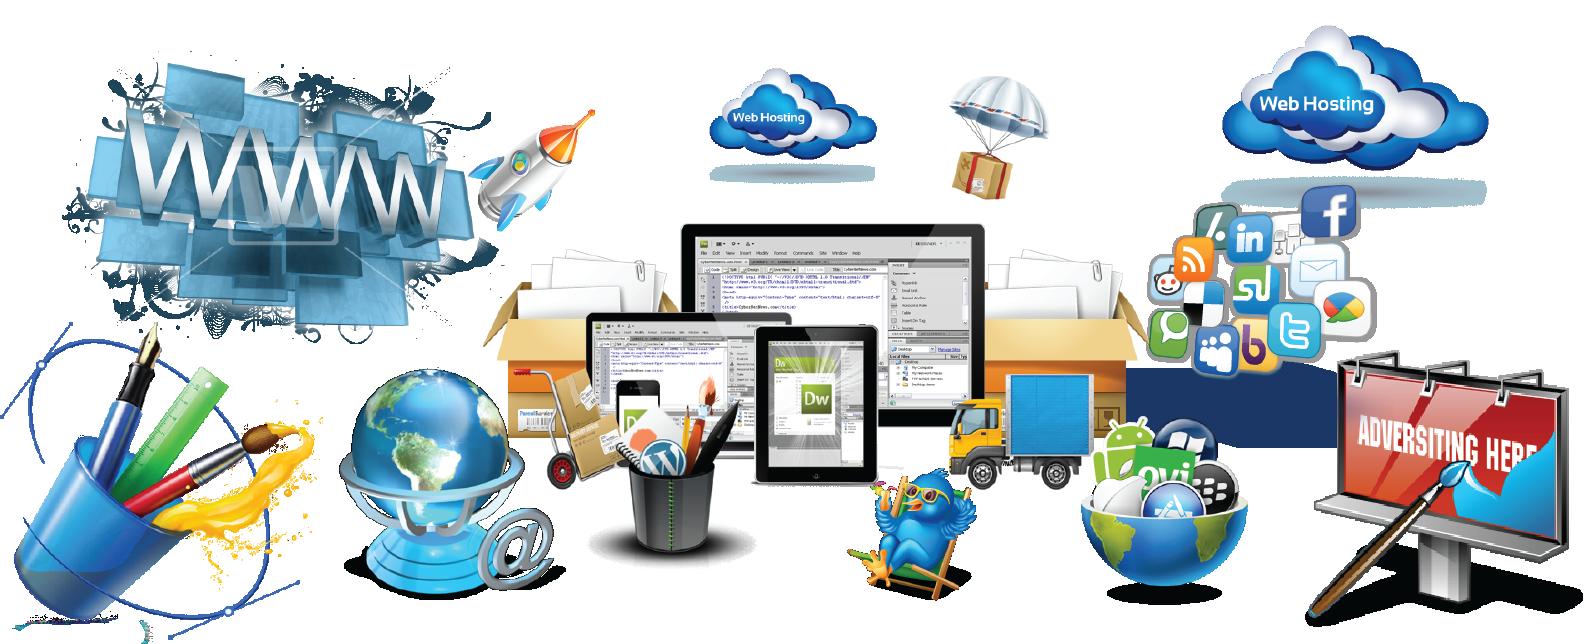 Ecommerce website design, Web design Sydney - Marrickville